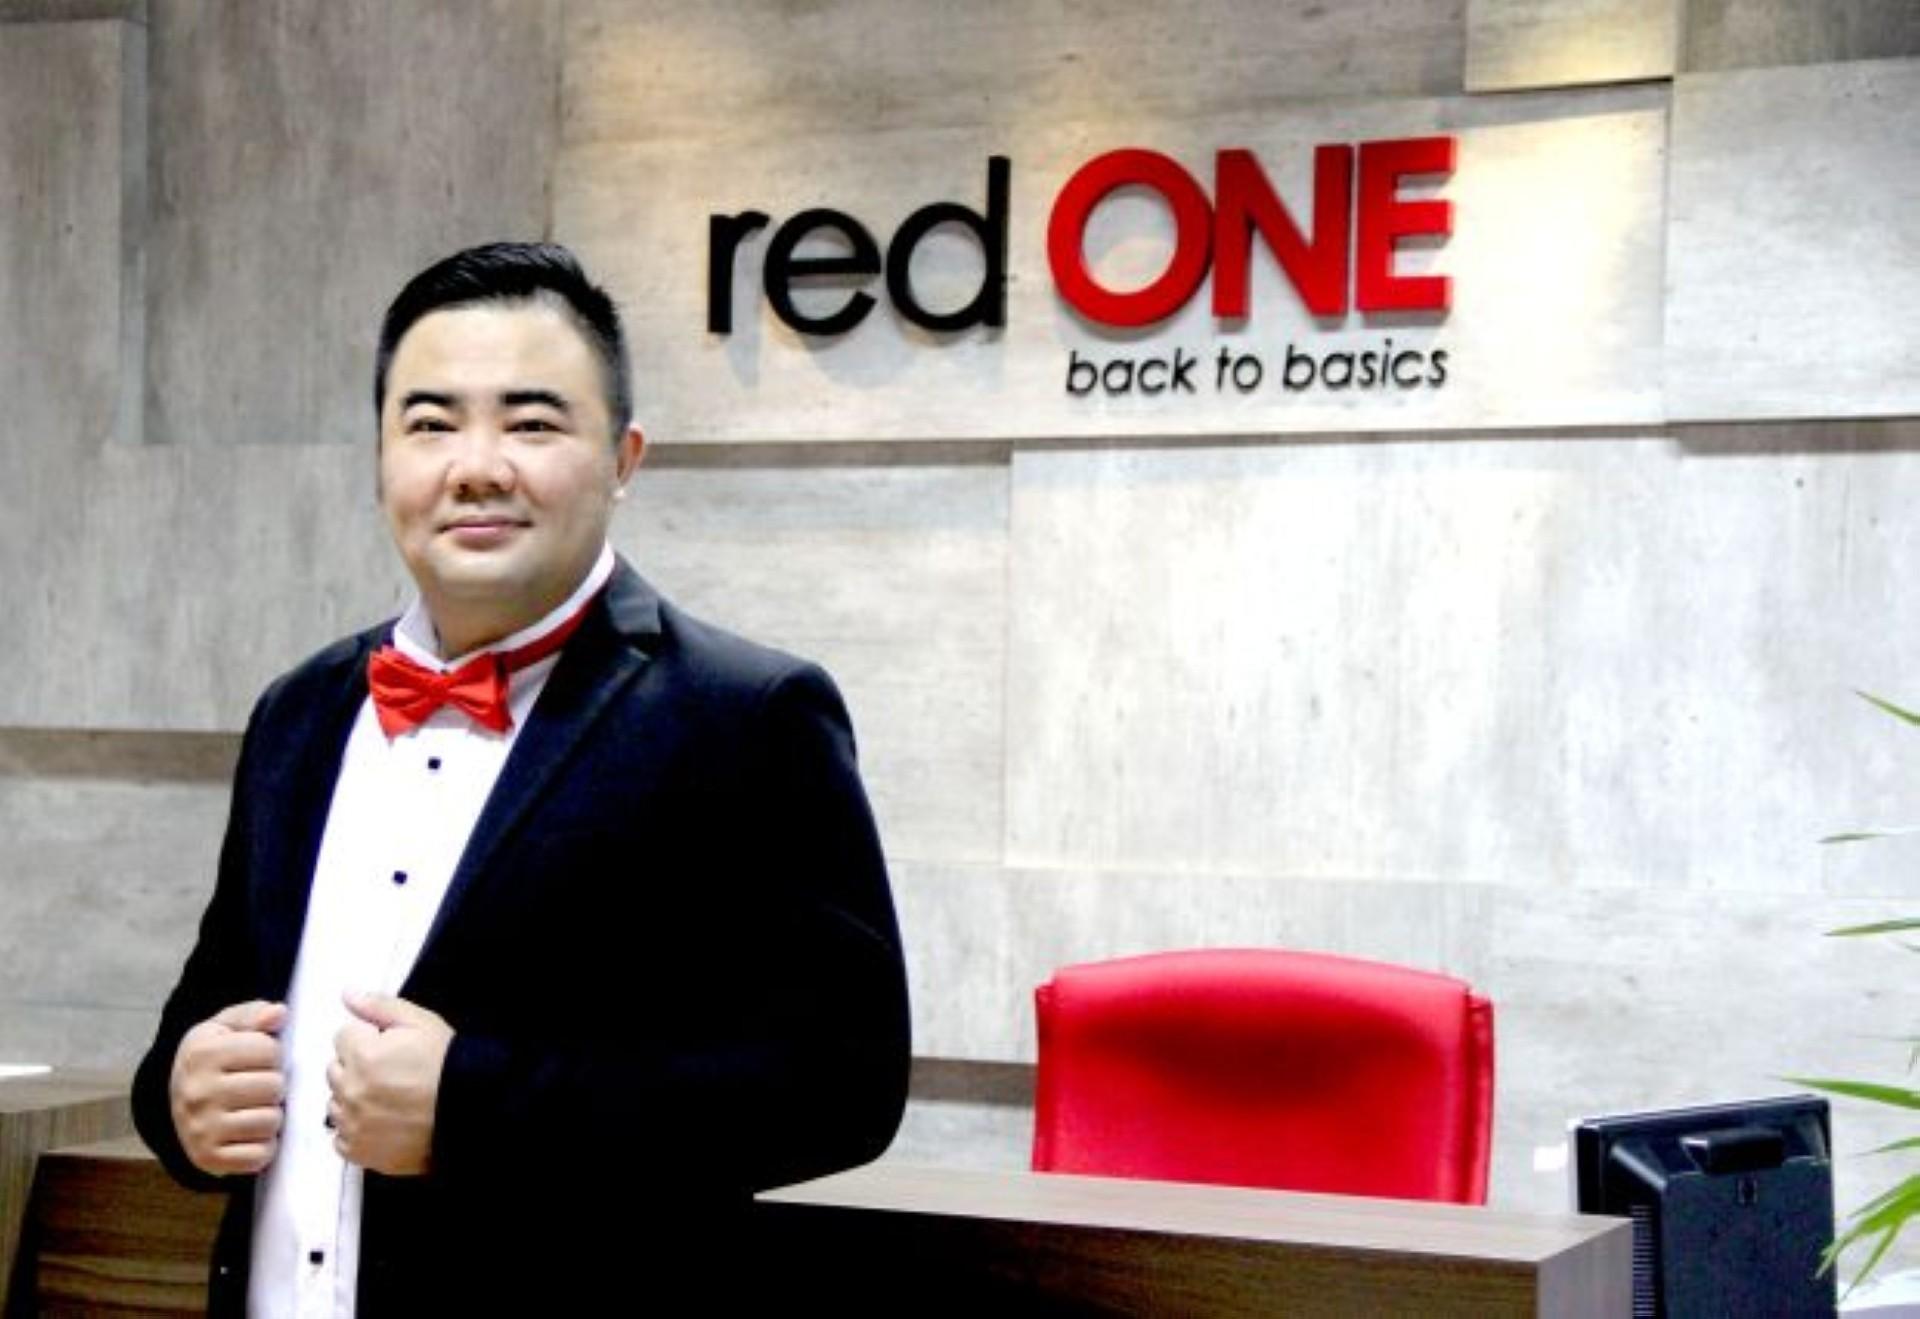 redONE chief sales officer Ben Teh Beng Hock